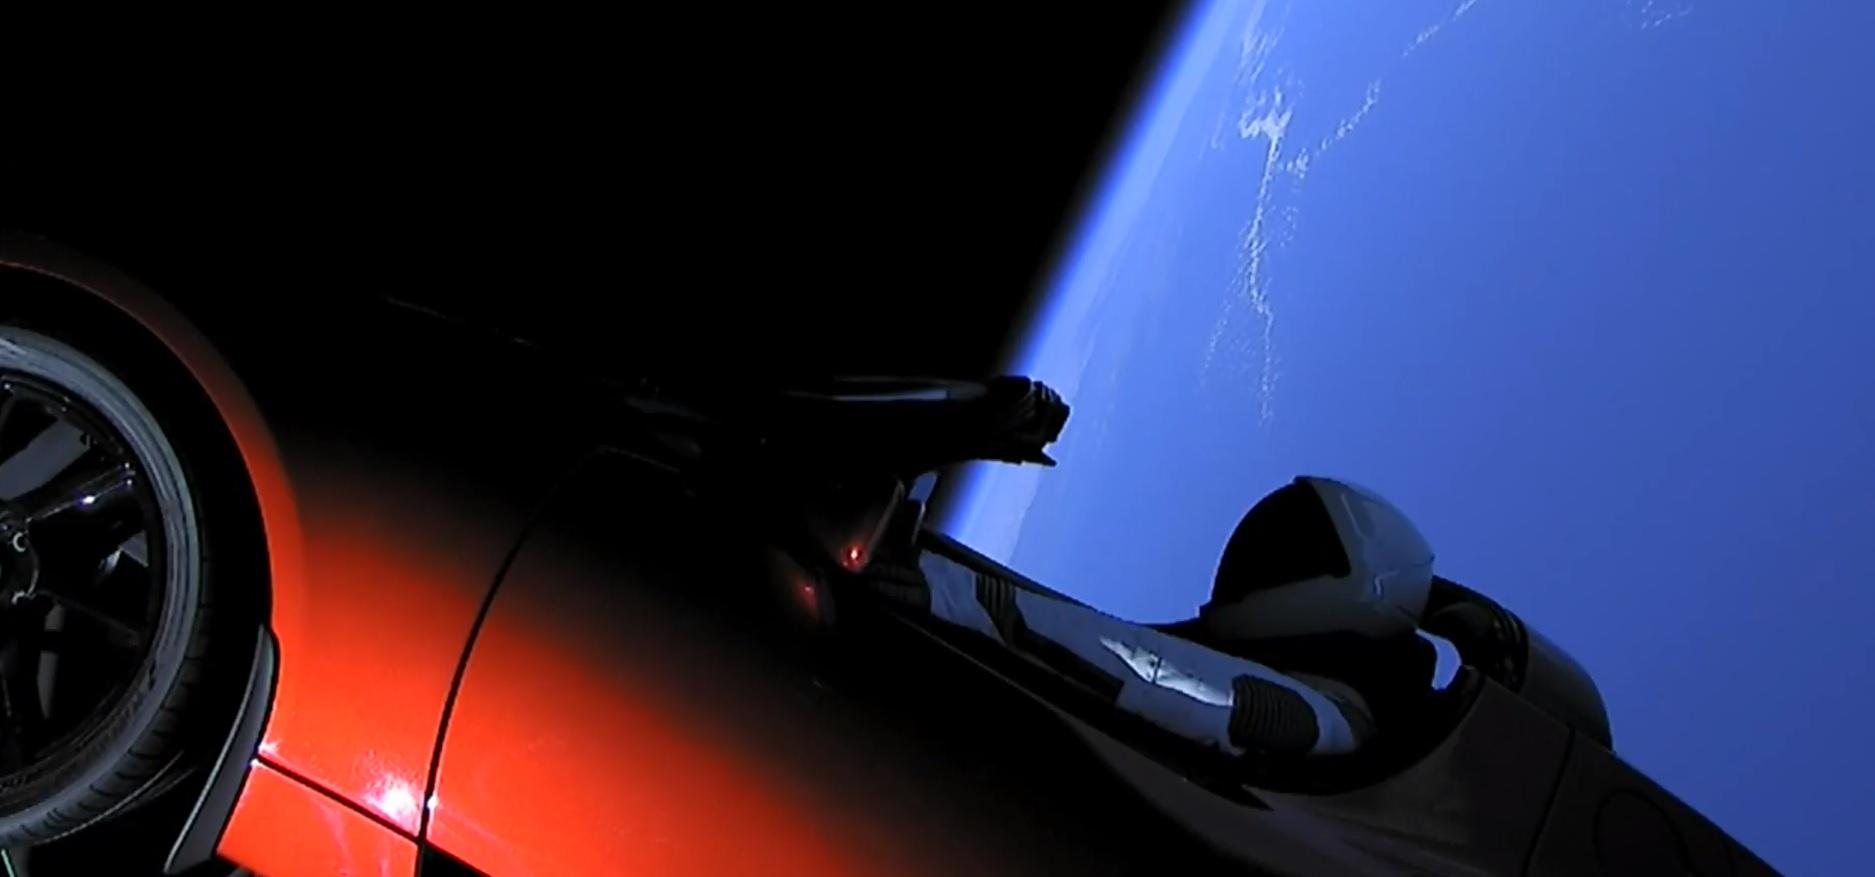 SpaceX успешно запустила ракету Falcon Heavy - Цензор.НЕТ 3098